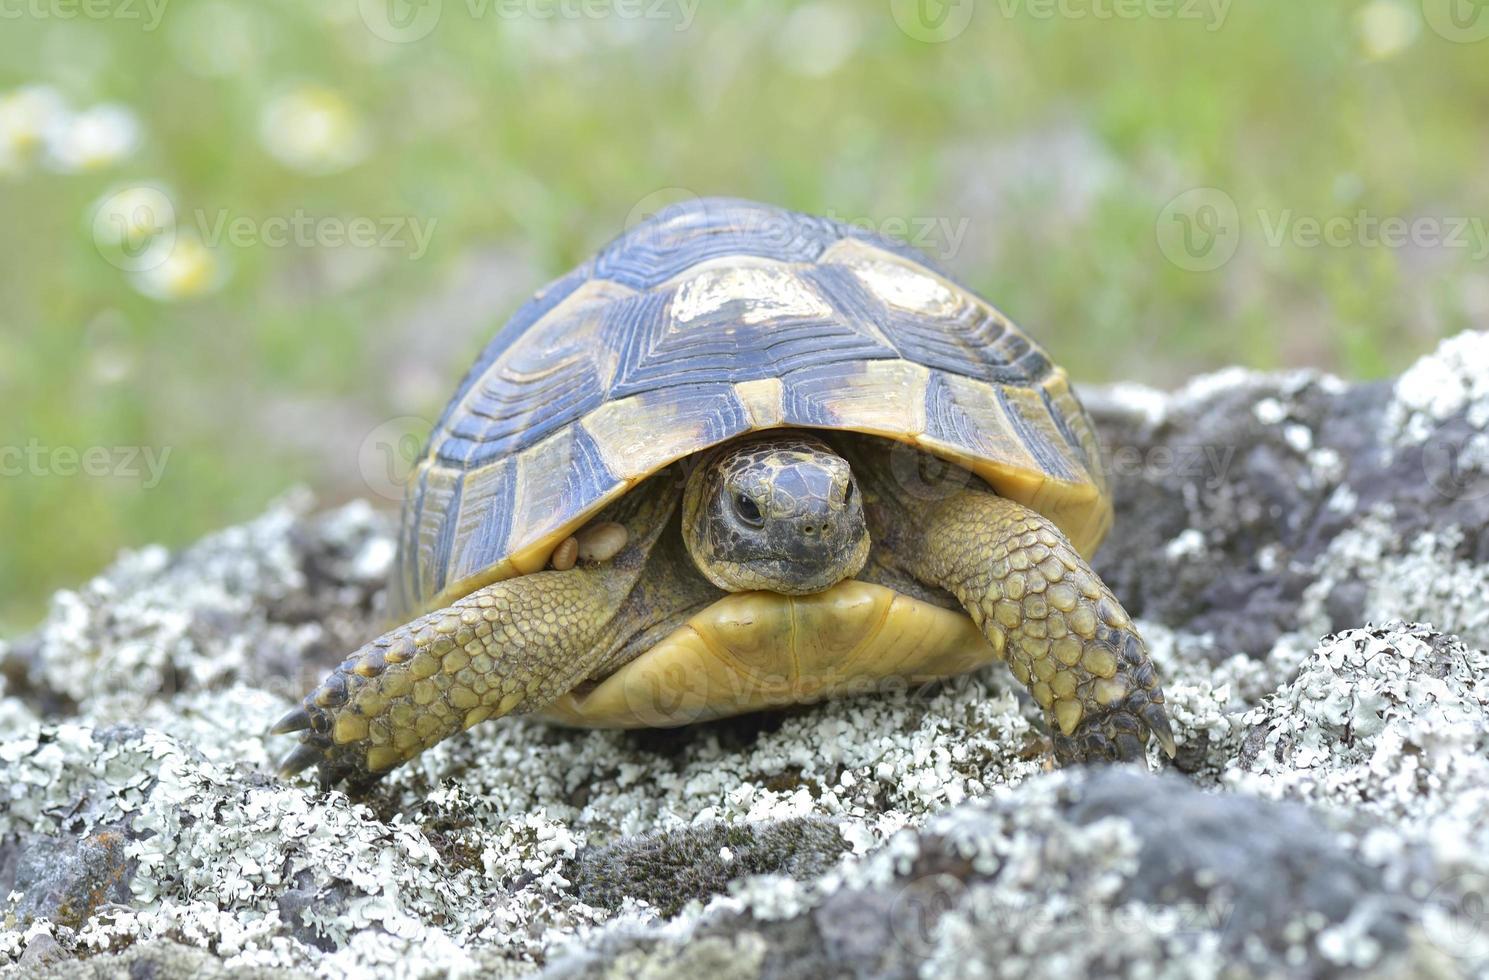 Spur thighed turtle (Testudo graeca) photo